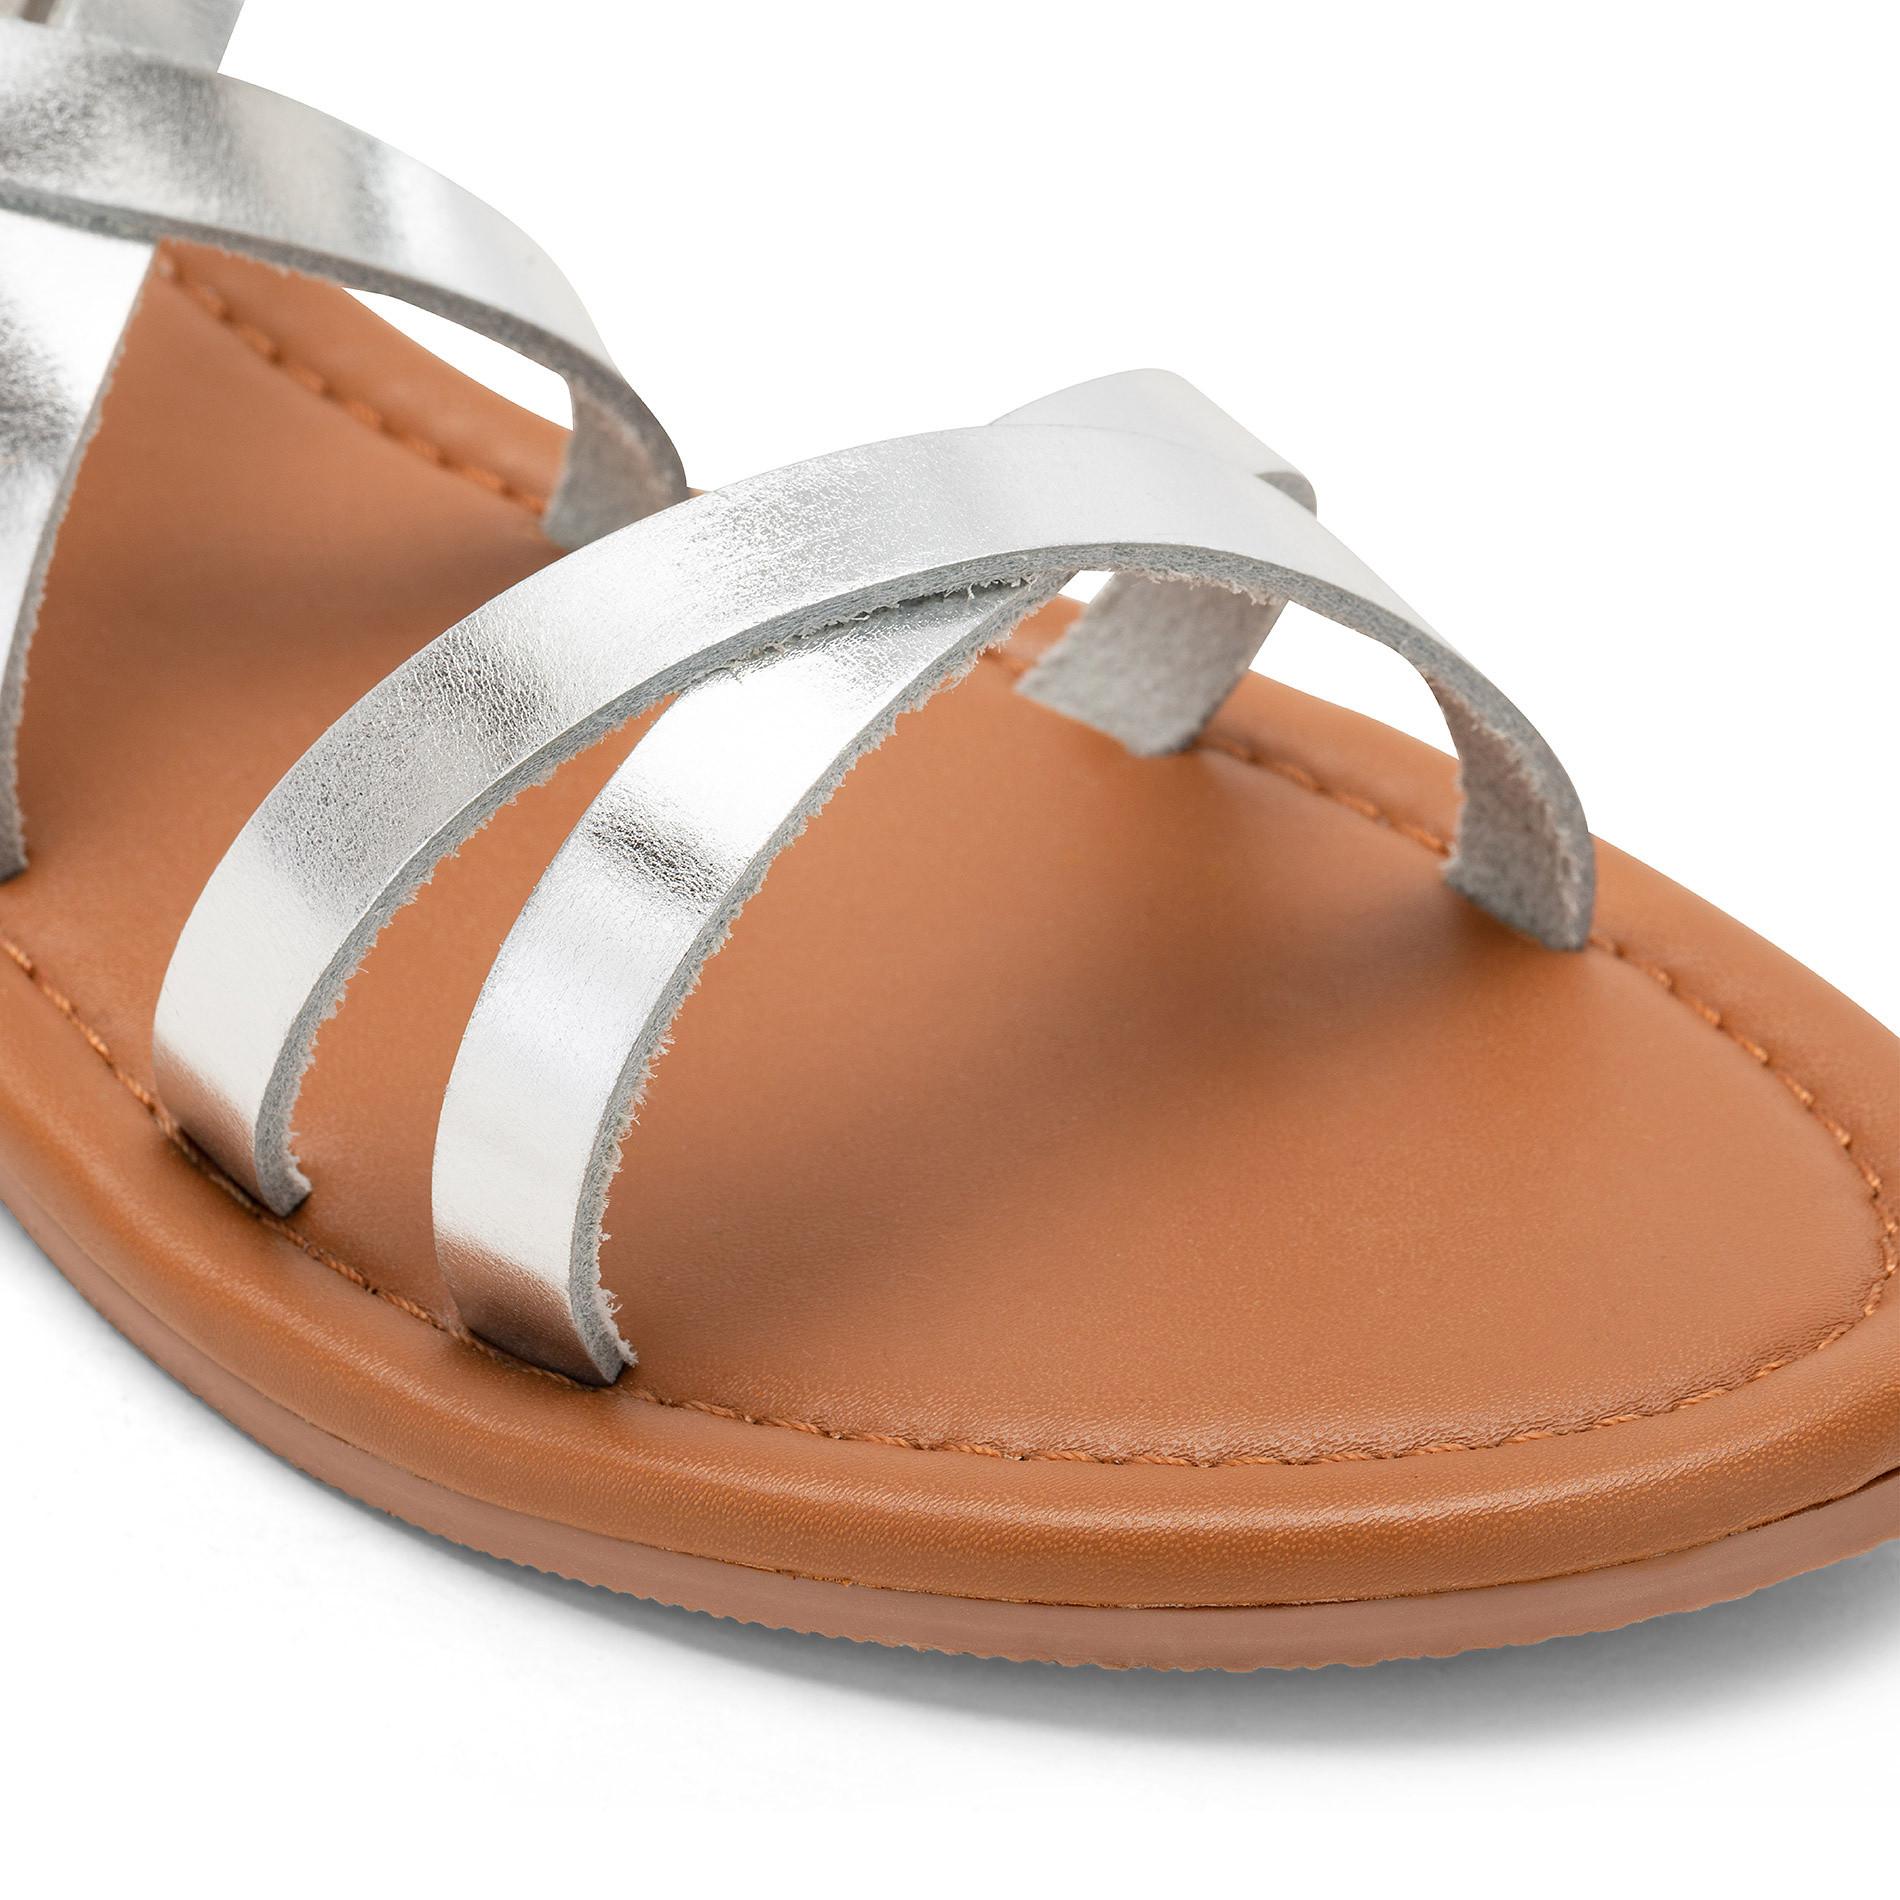 Sandalo con fascette metallizzate, Grigio argento, large image number 2